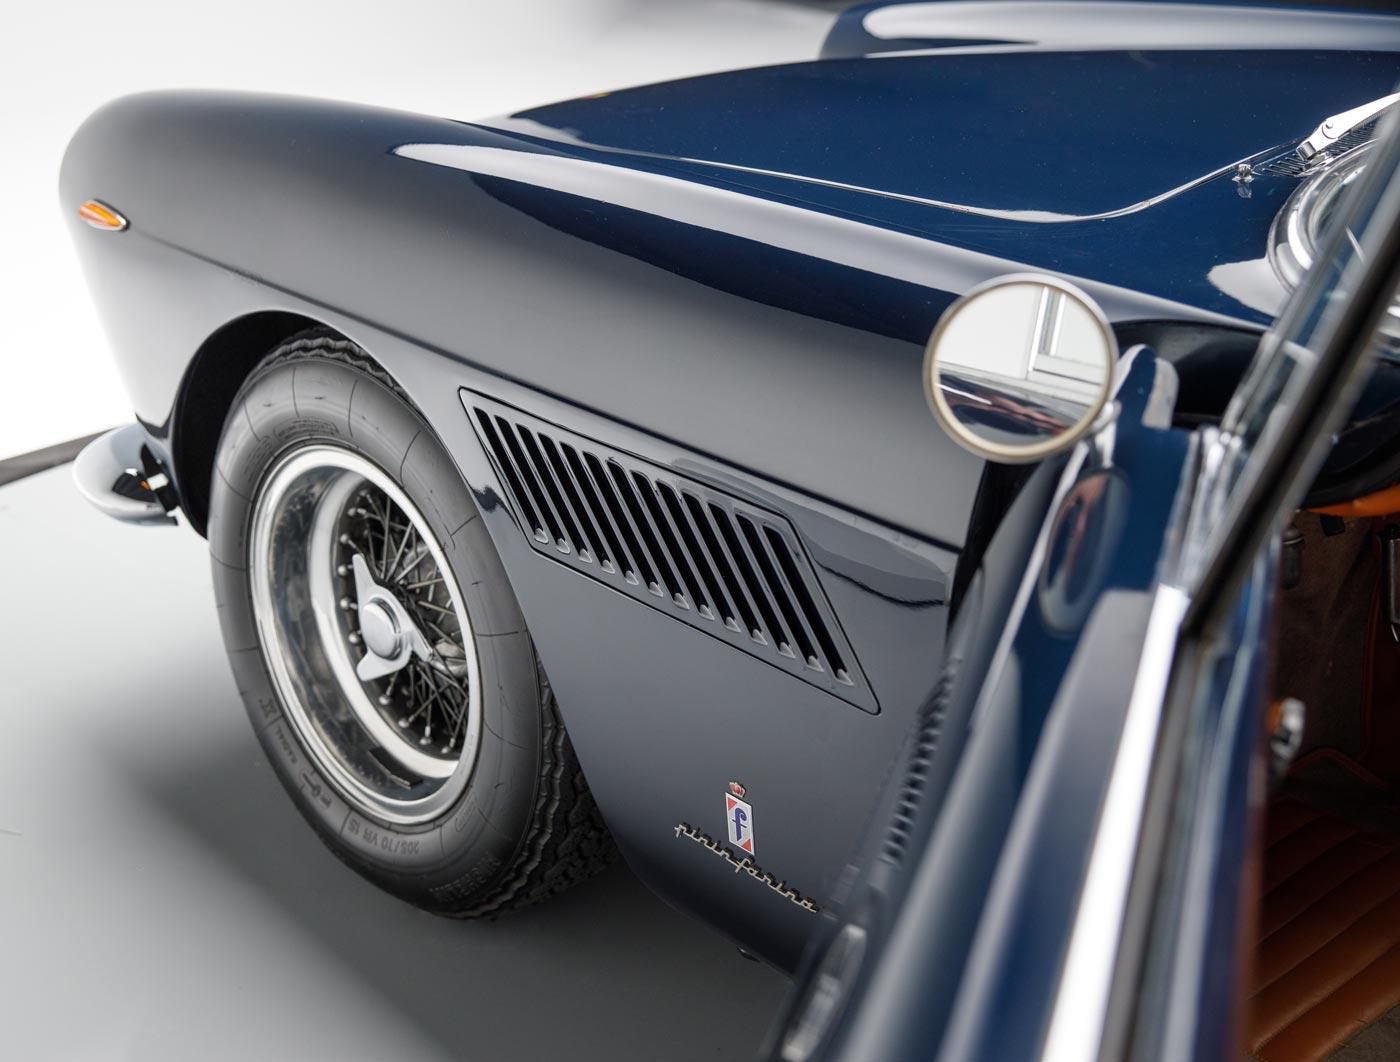 1963 Ferrari 250 GTE - The JBS Collection